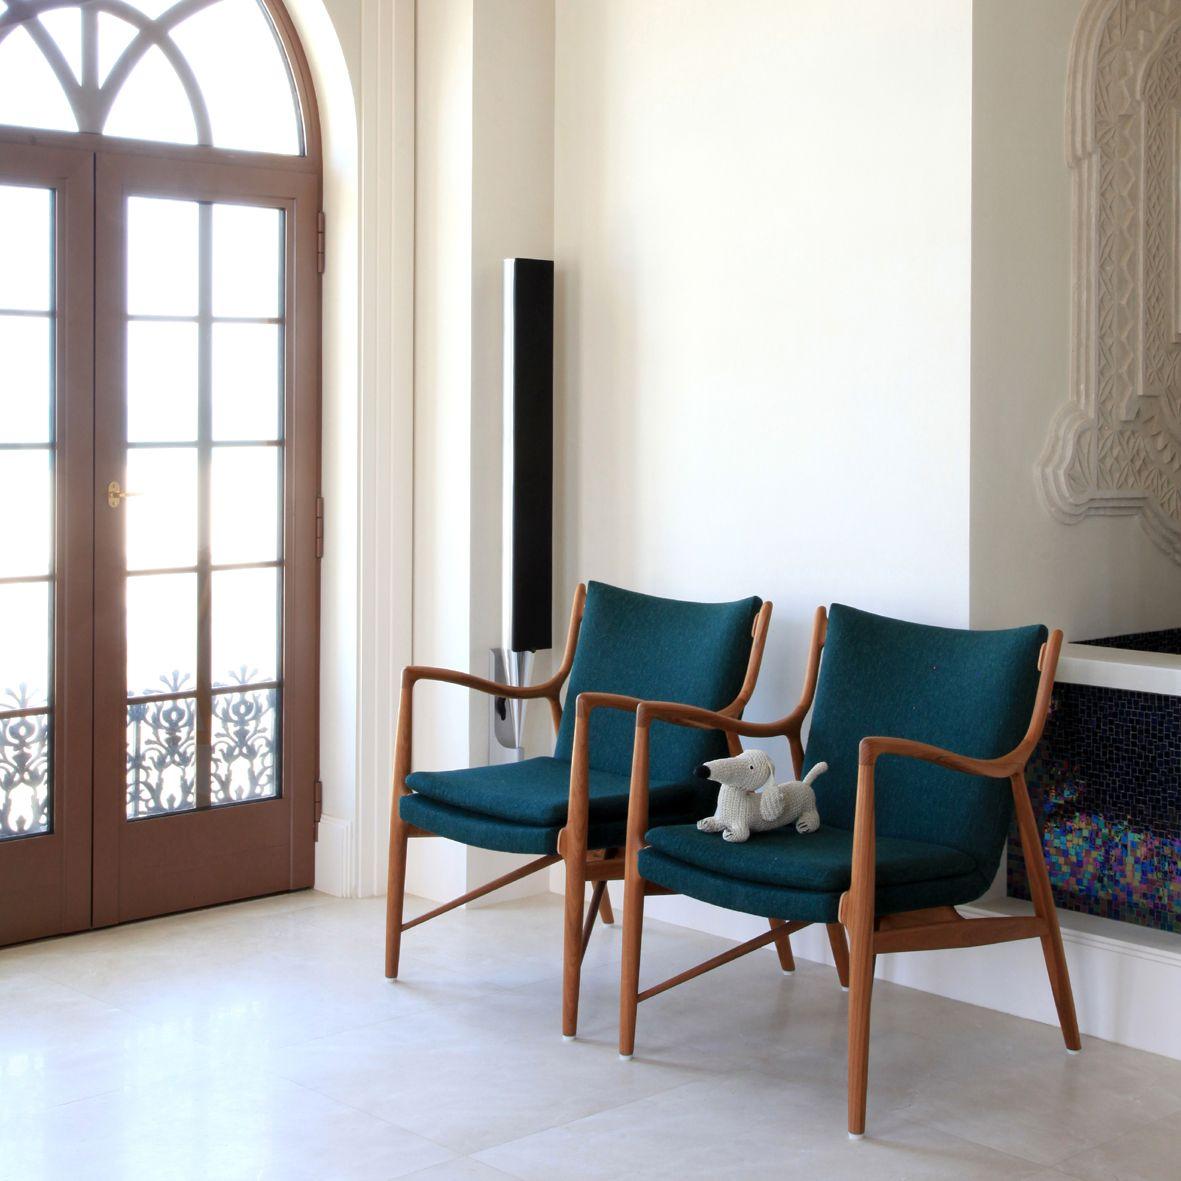 Finn juhl the baker sofa - 45 Chairs By Finn Juhl